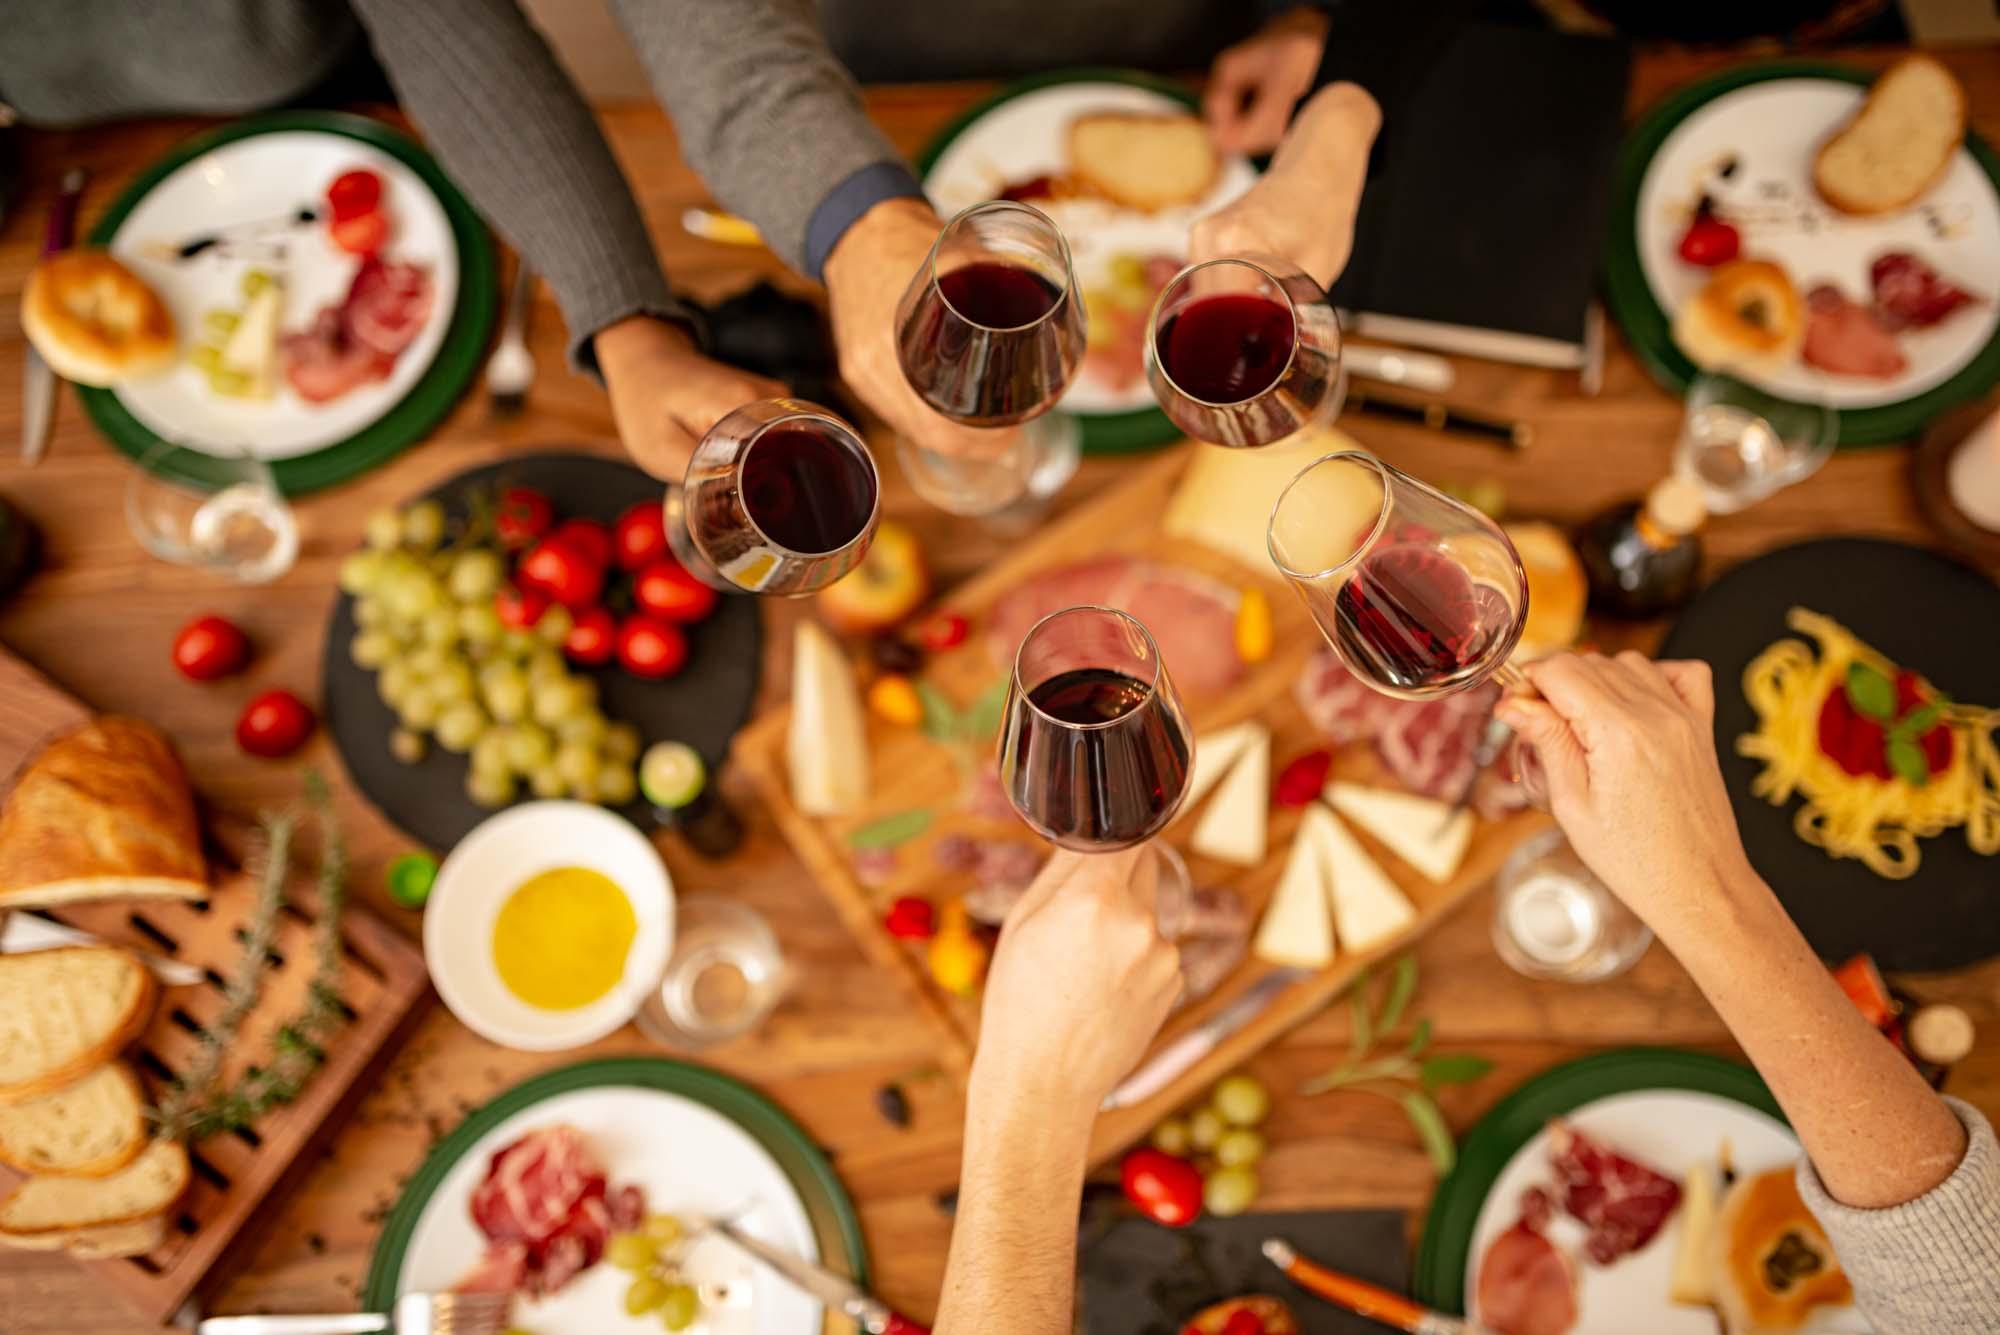 Corsi Di Cucina Formazione Manageriale a Pescara